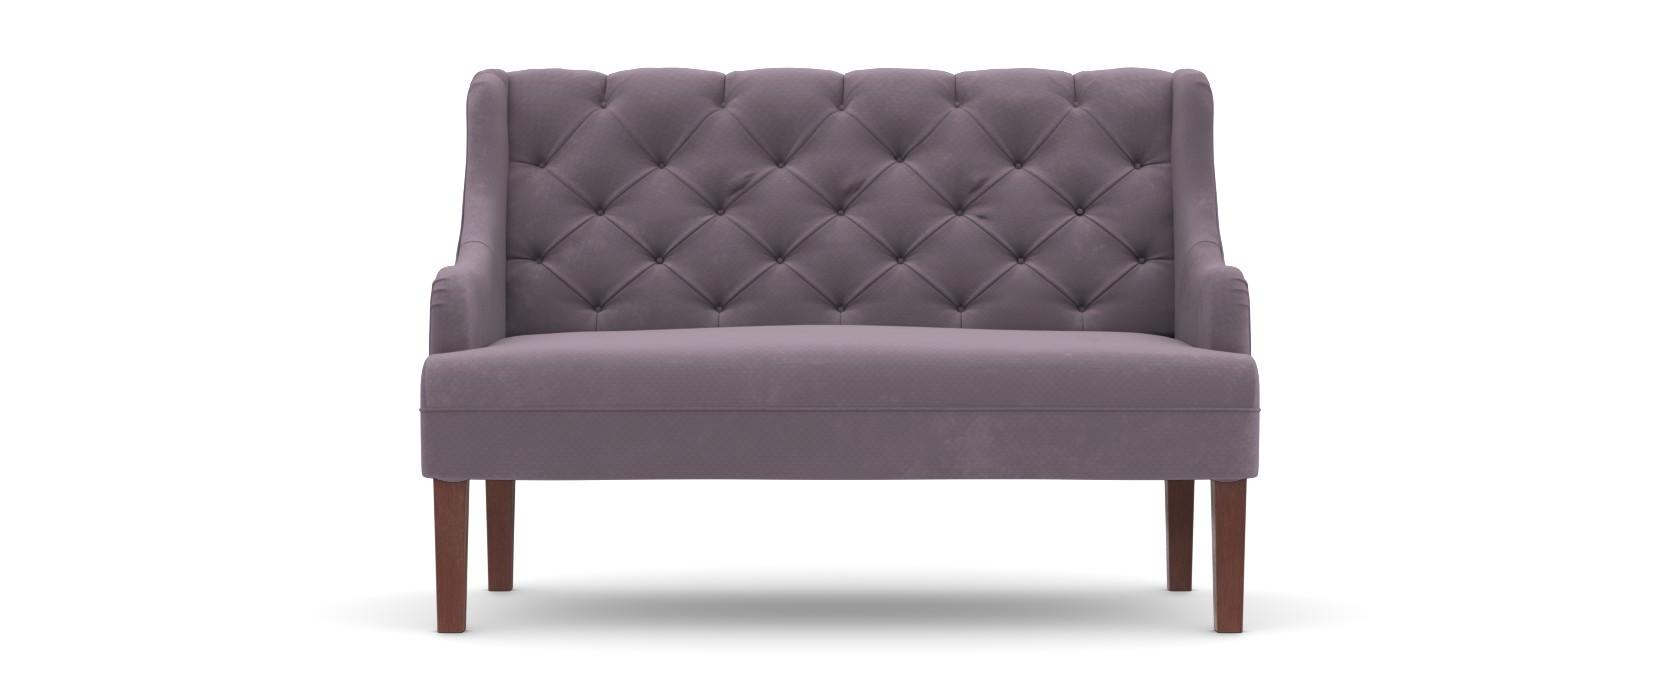 Двомісний диван Ennio - Pufetto